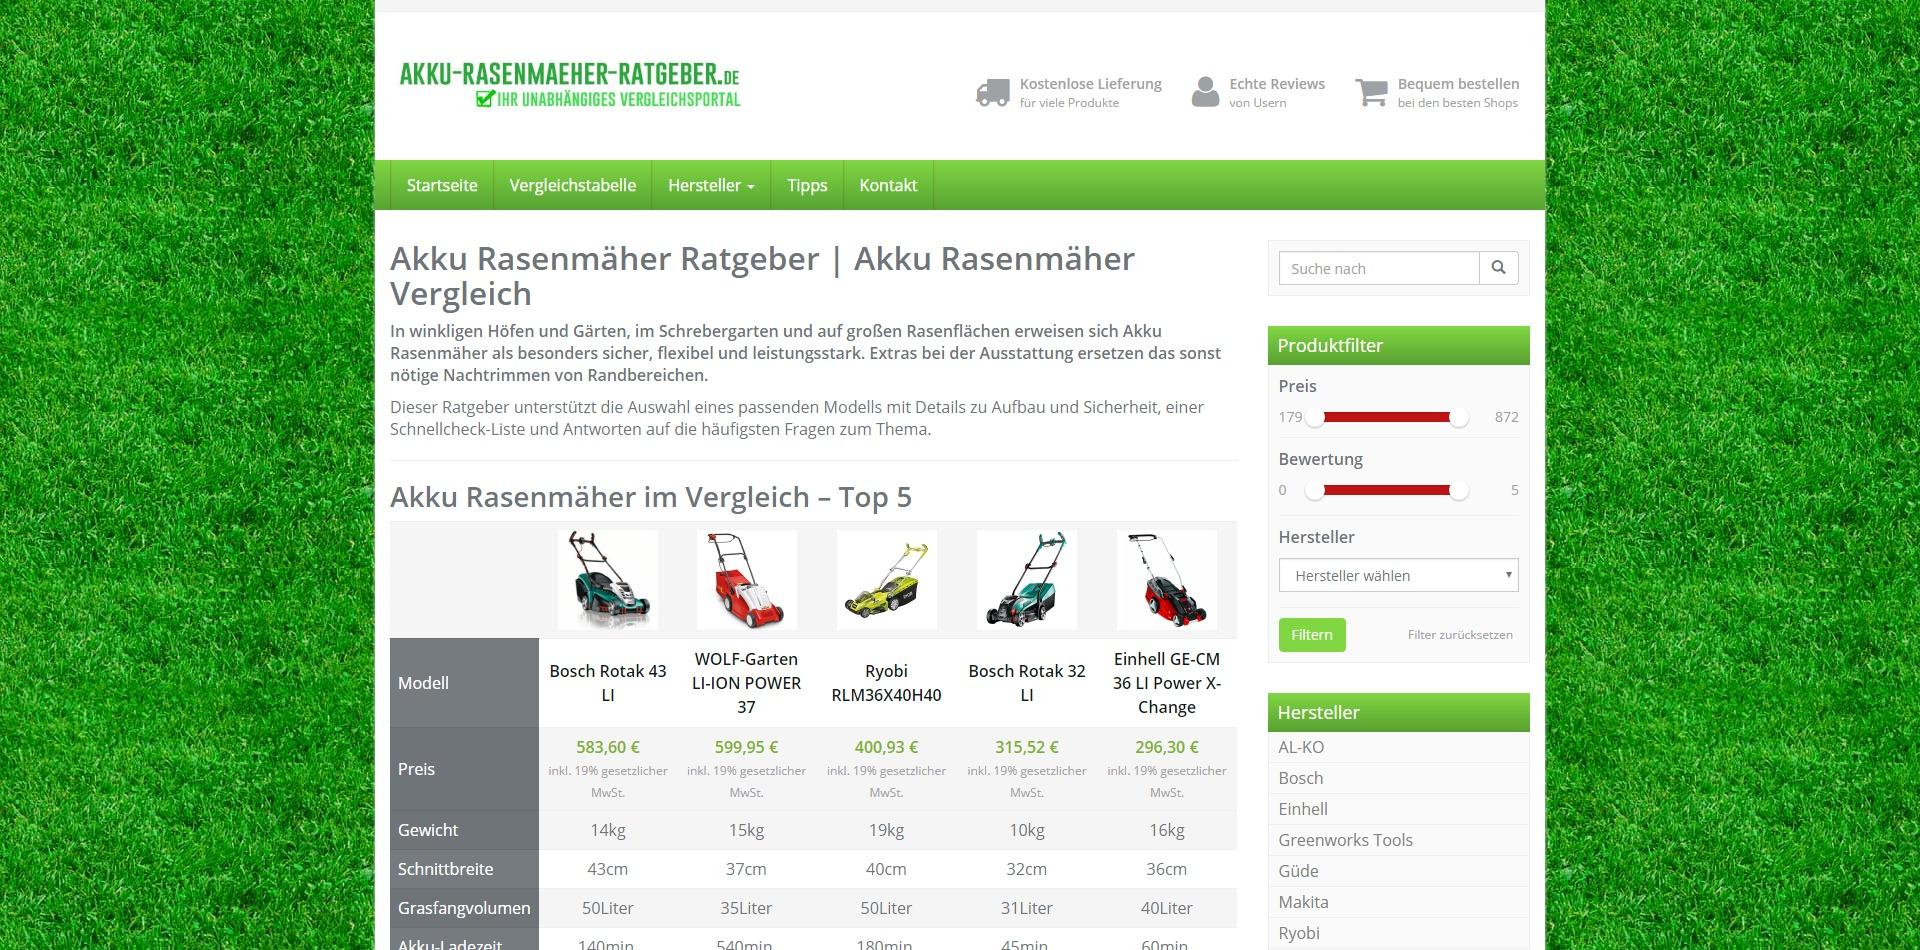 Ratgeberportal akku-rasenmaeher-ratgeber.de